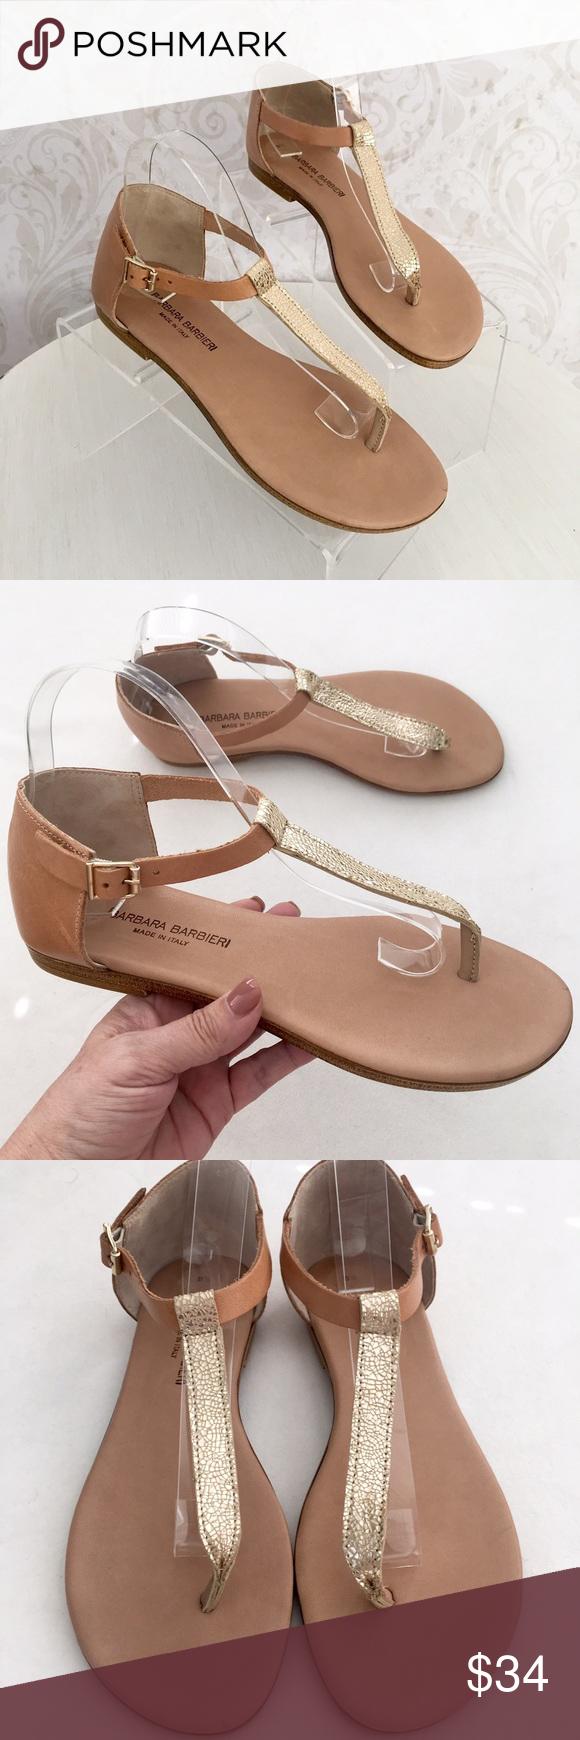 57969ce354449 Barbara Barbieri tan   gold thong sandal I love this brand! Great quality  but still